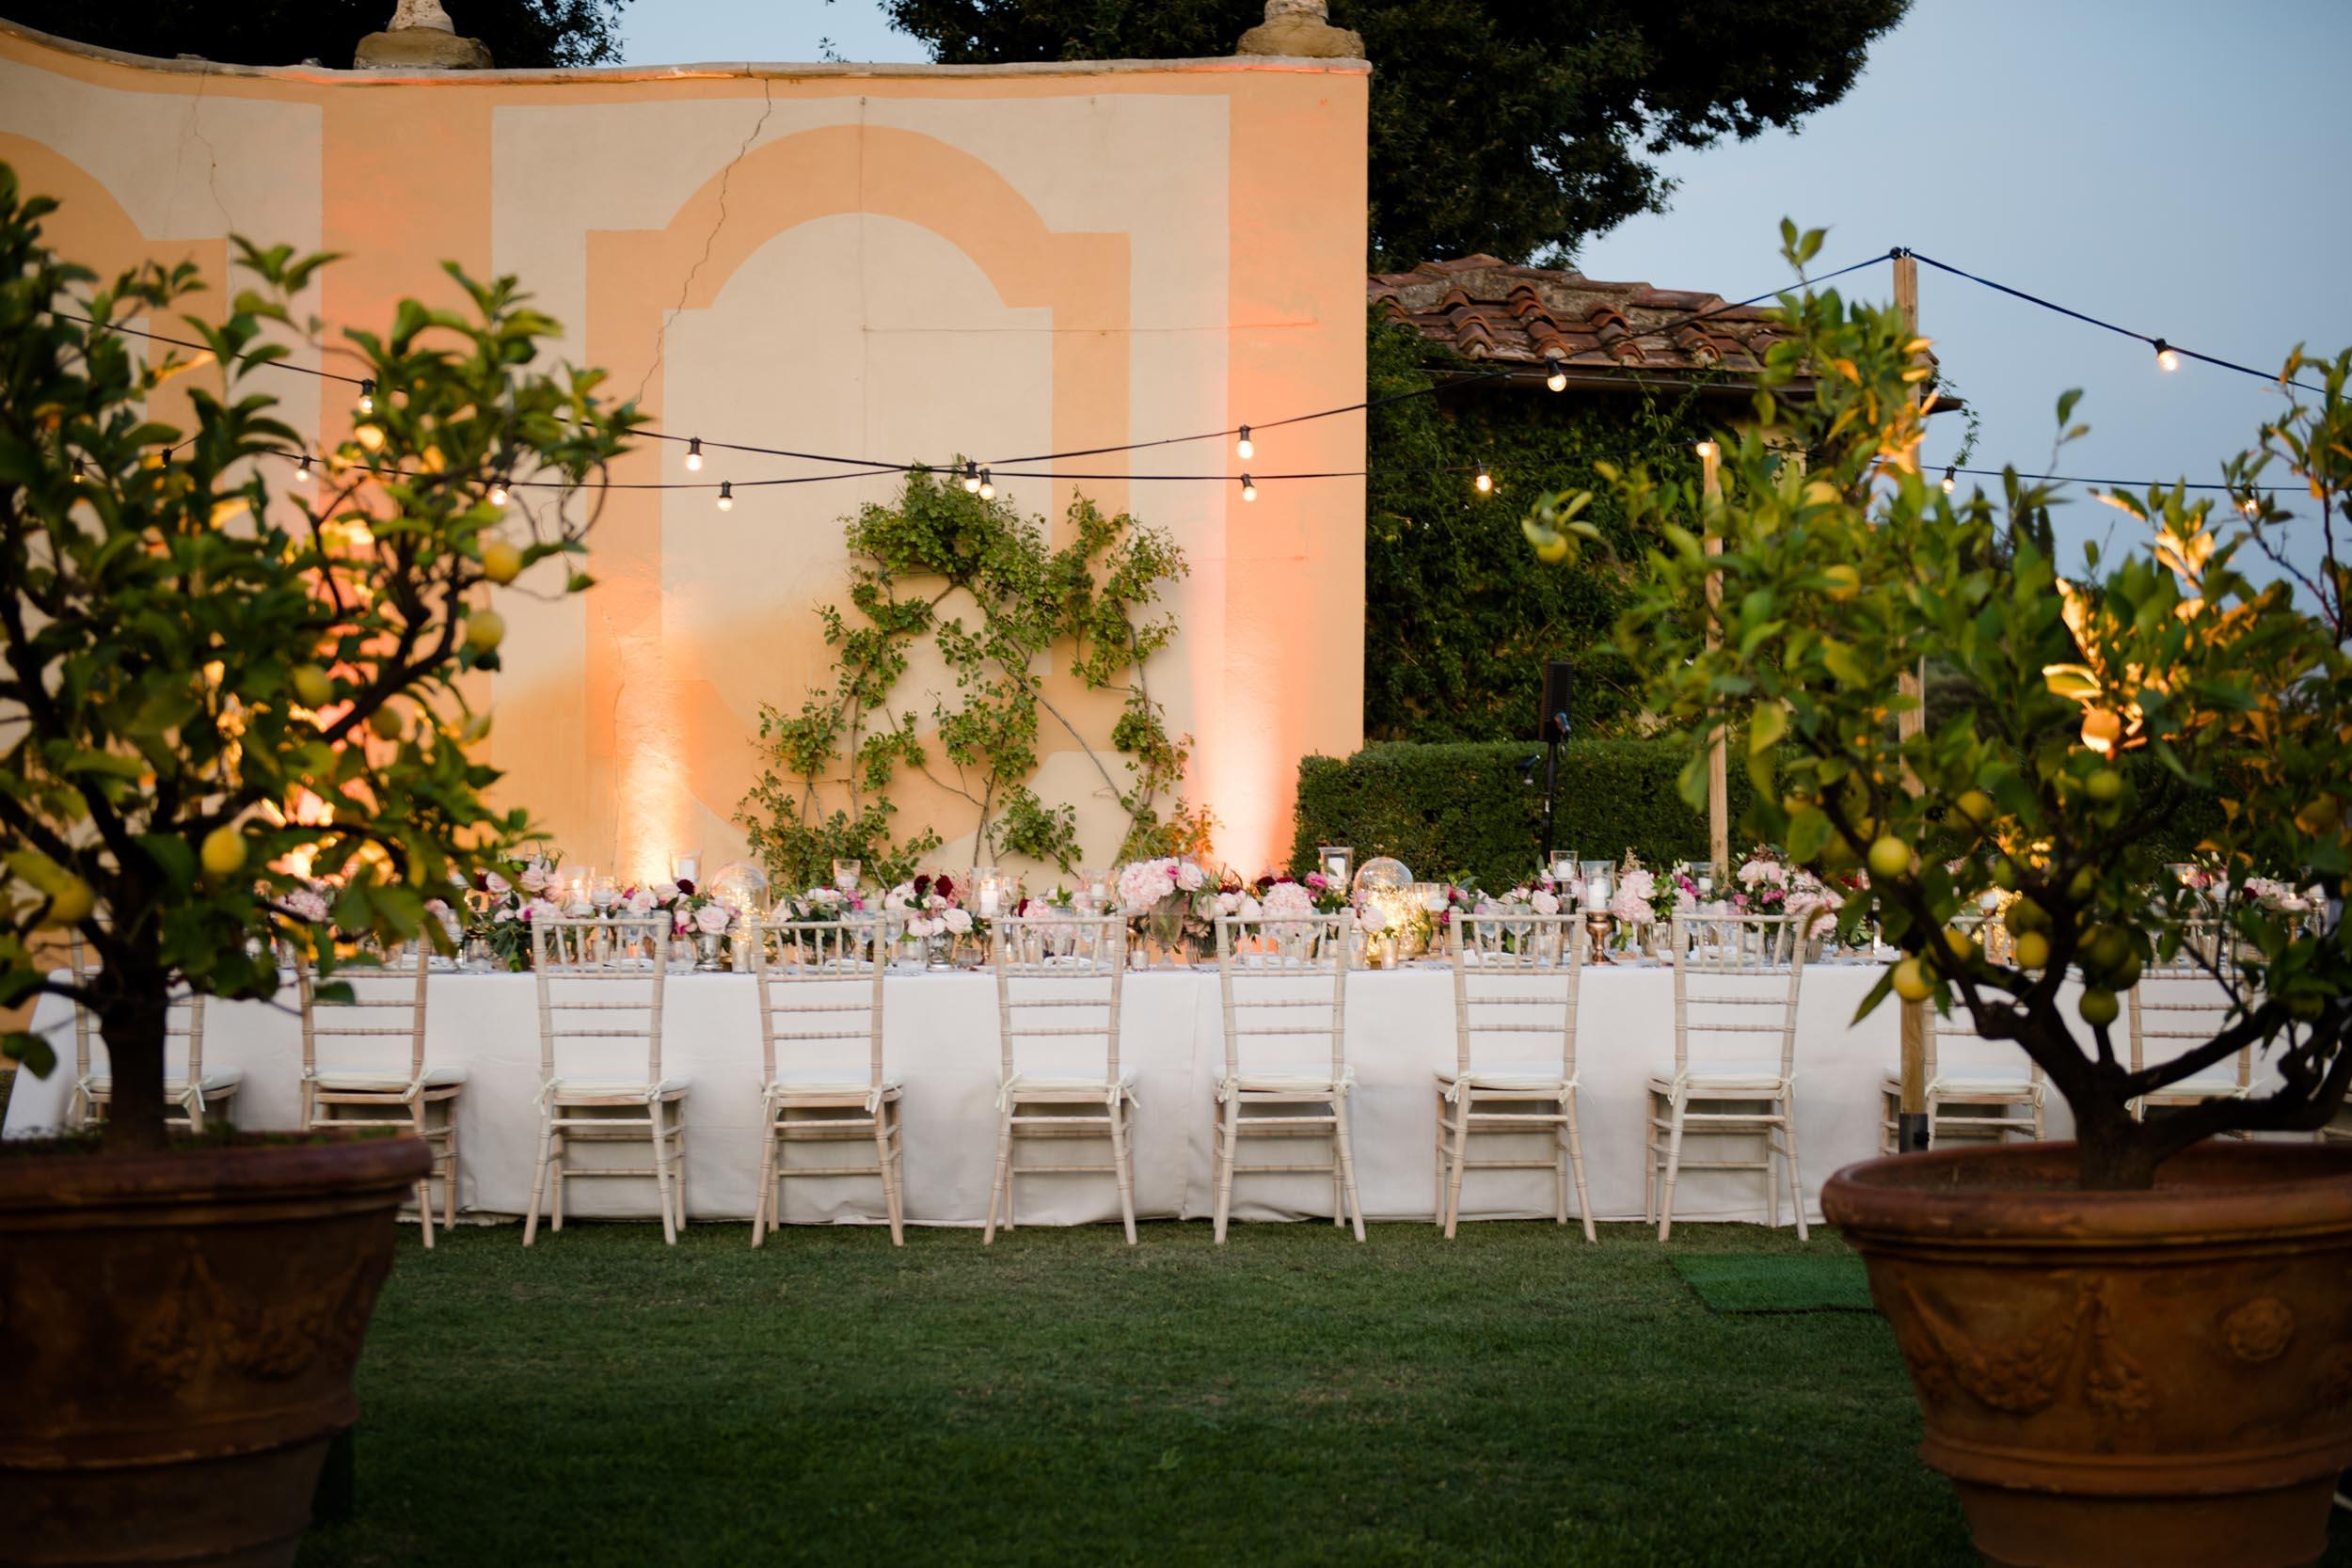 villa-gamberaia-florence-italy-destination-wedding-70.jpg